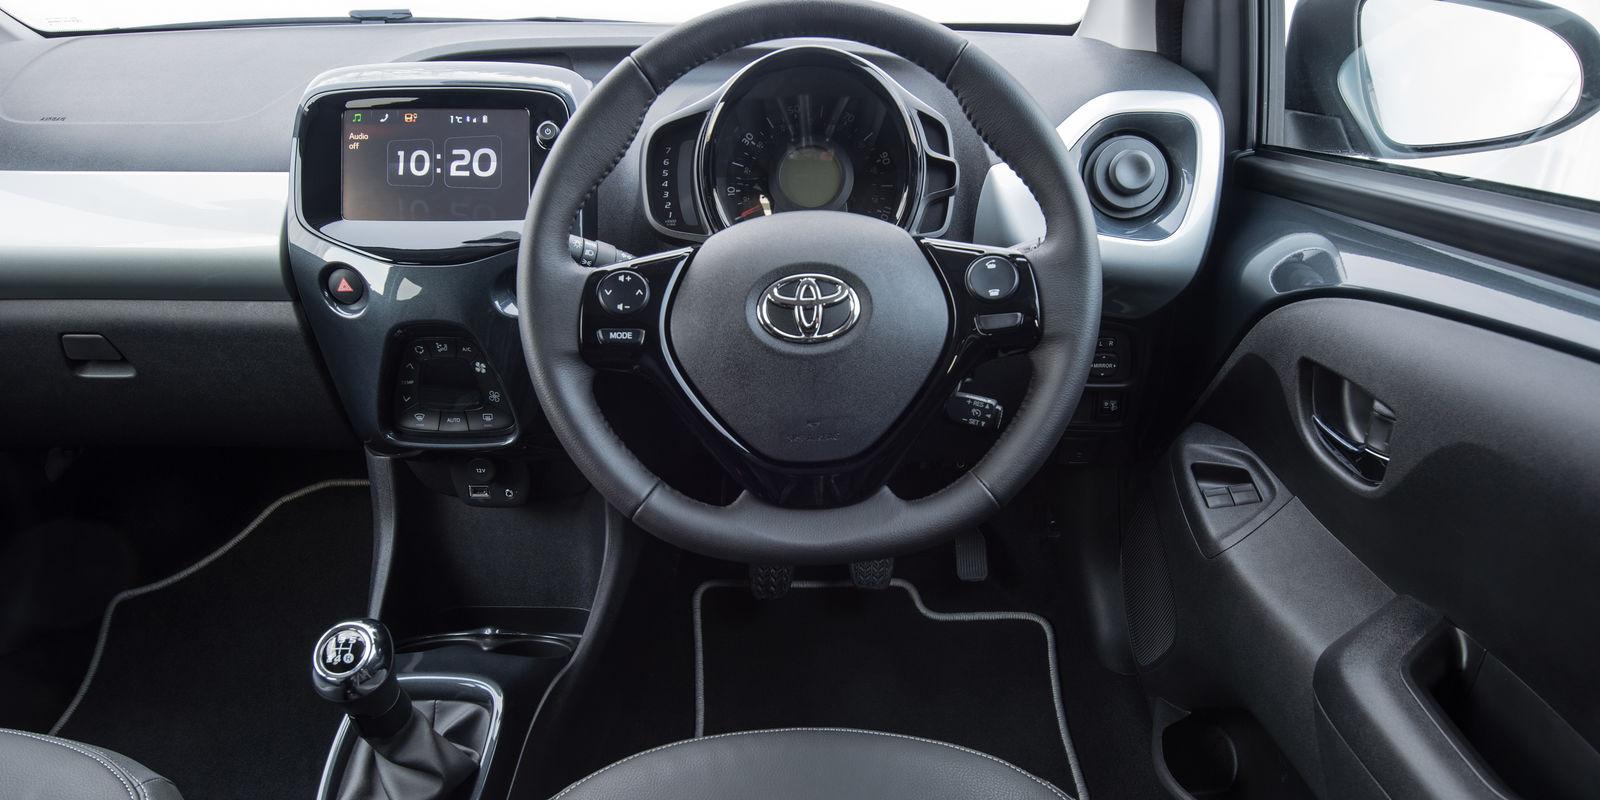 Toyota aygo review carwow - Toyota aygo interior ...